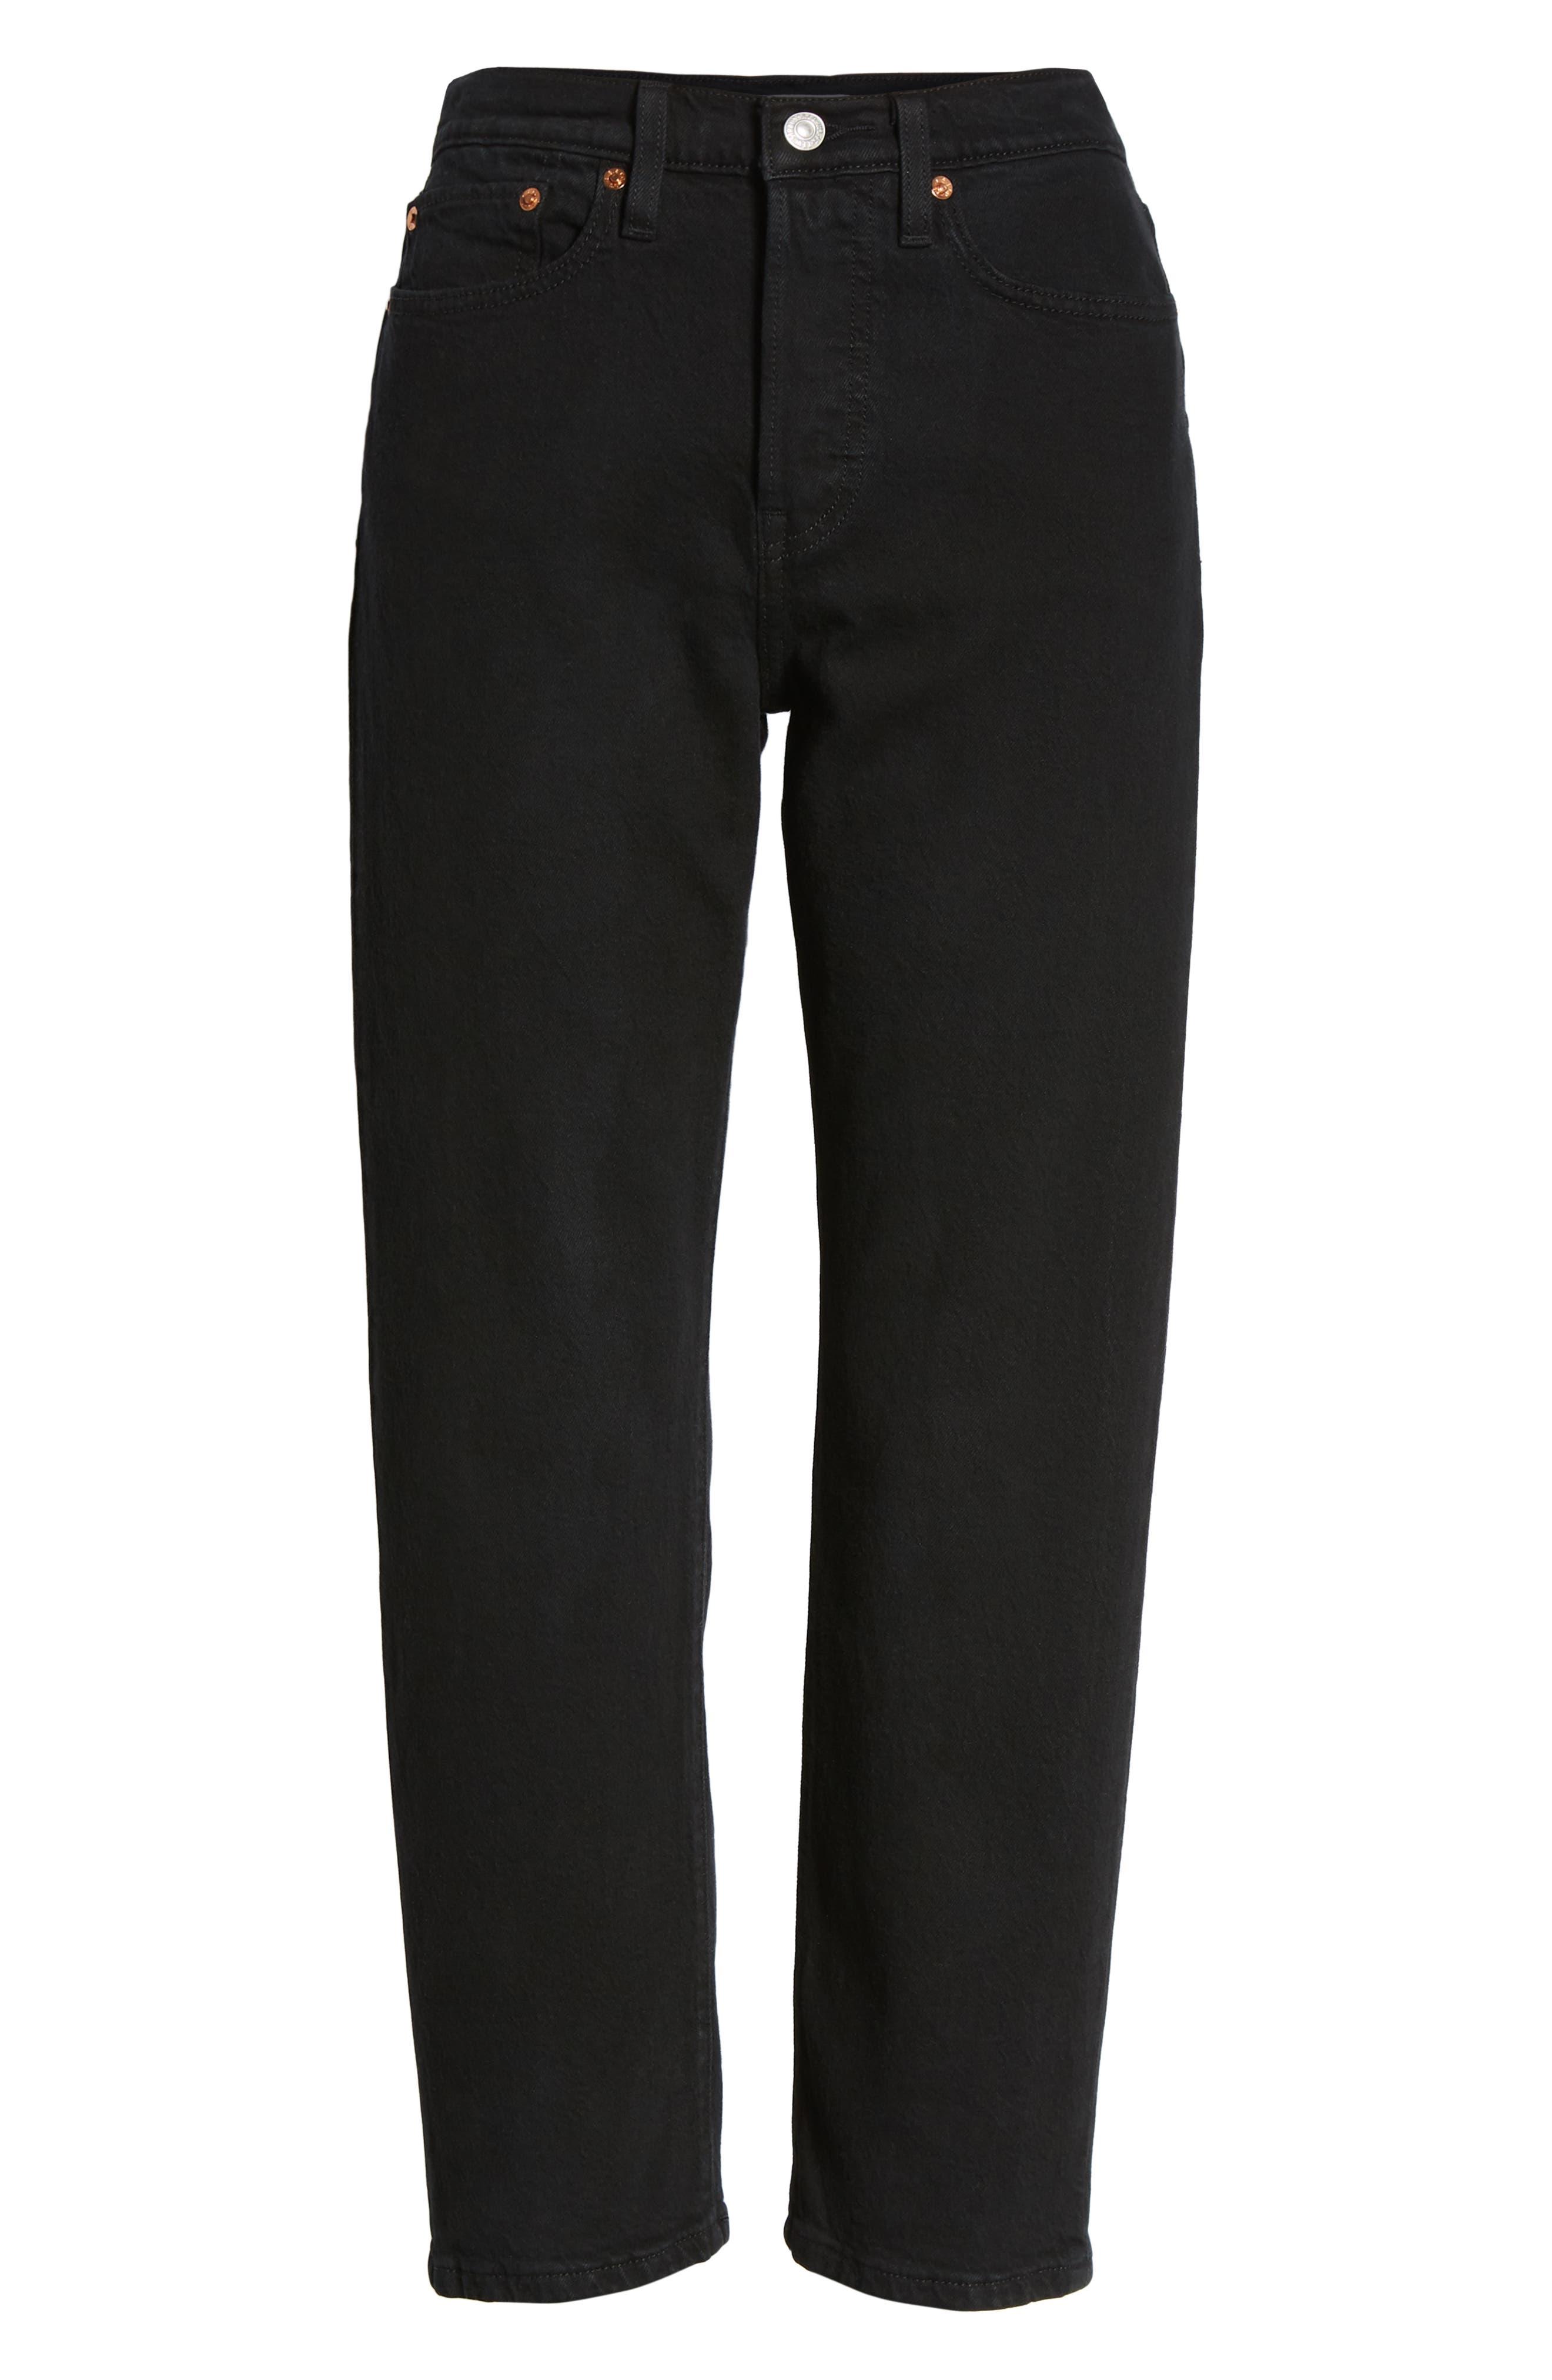 Wedgie High Waist Straight Jeans,                             Alternate thumbnail 7, color,                             BLACK HEART